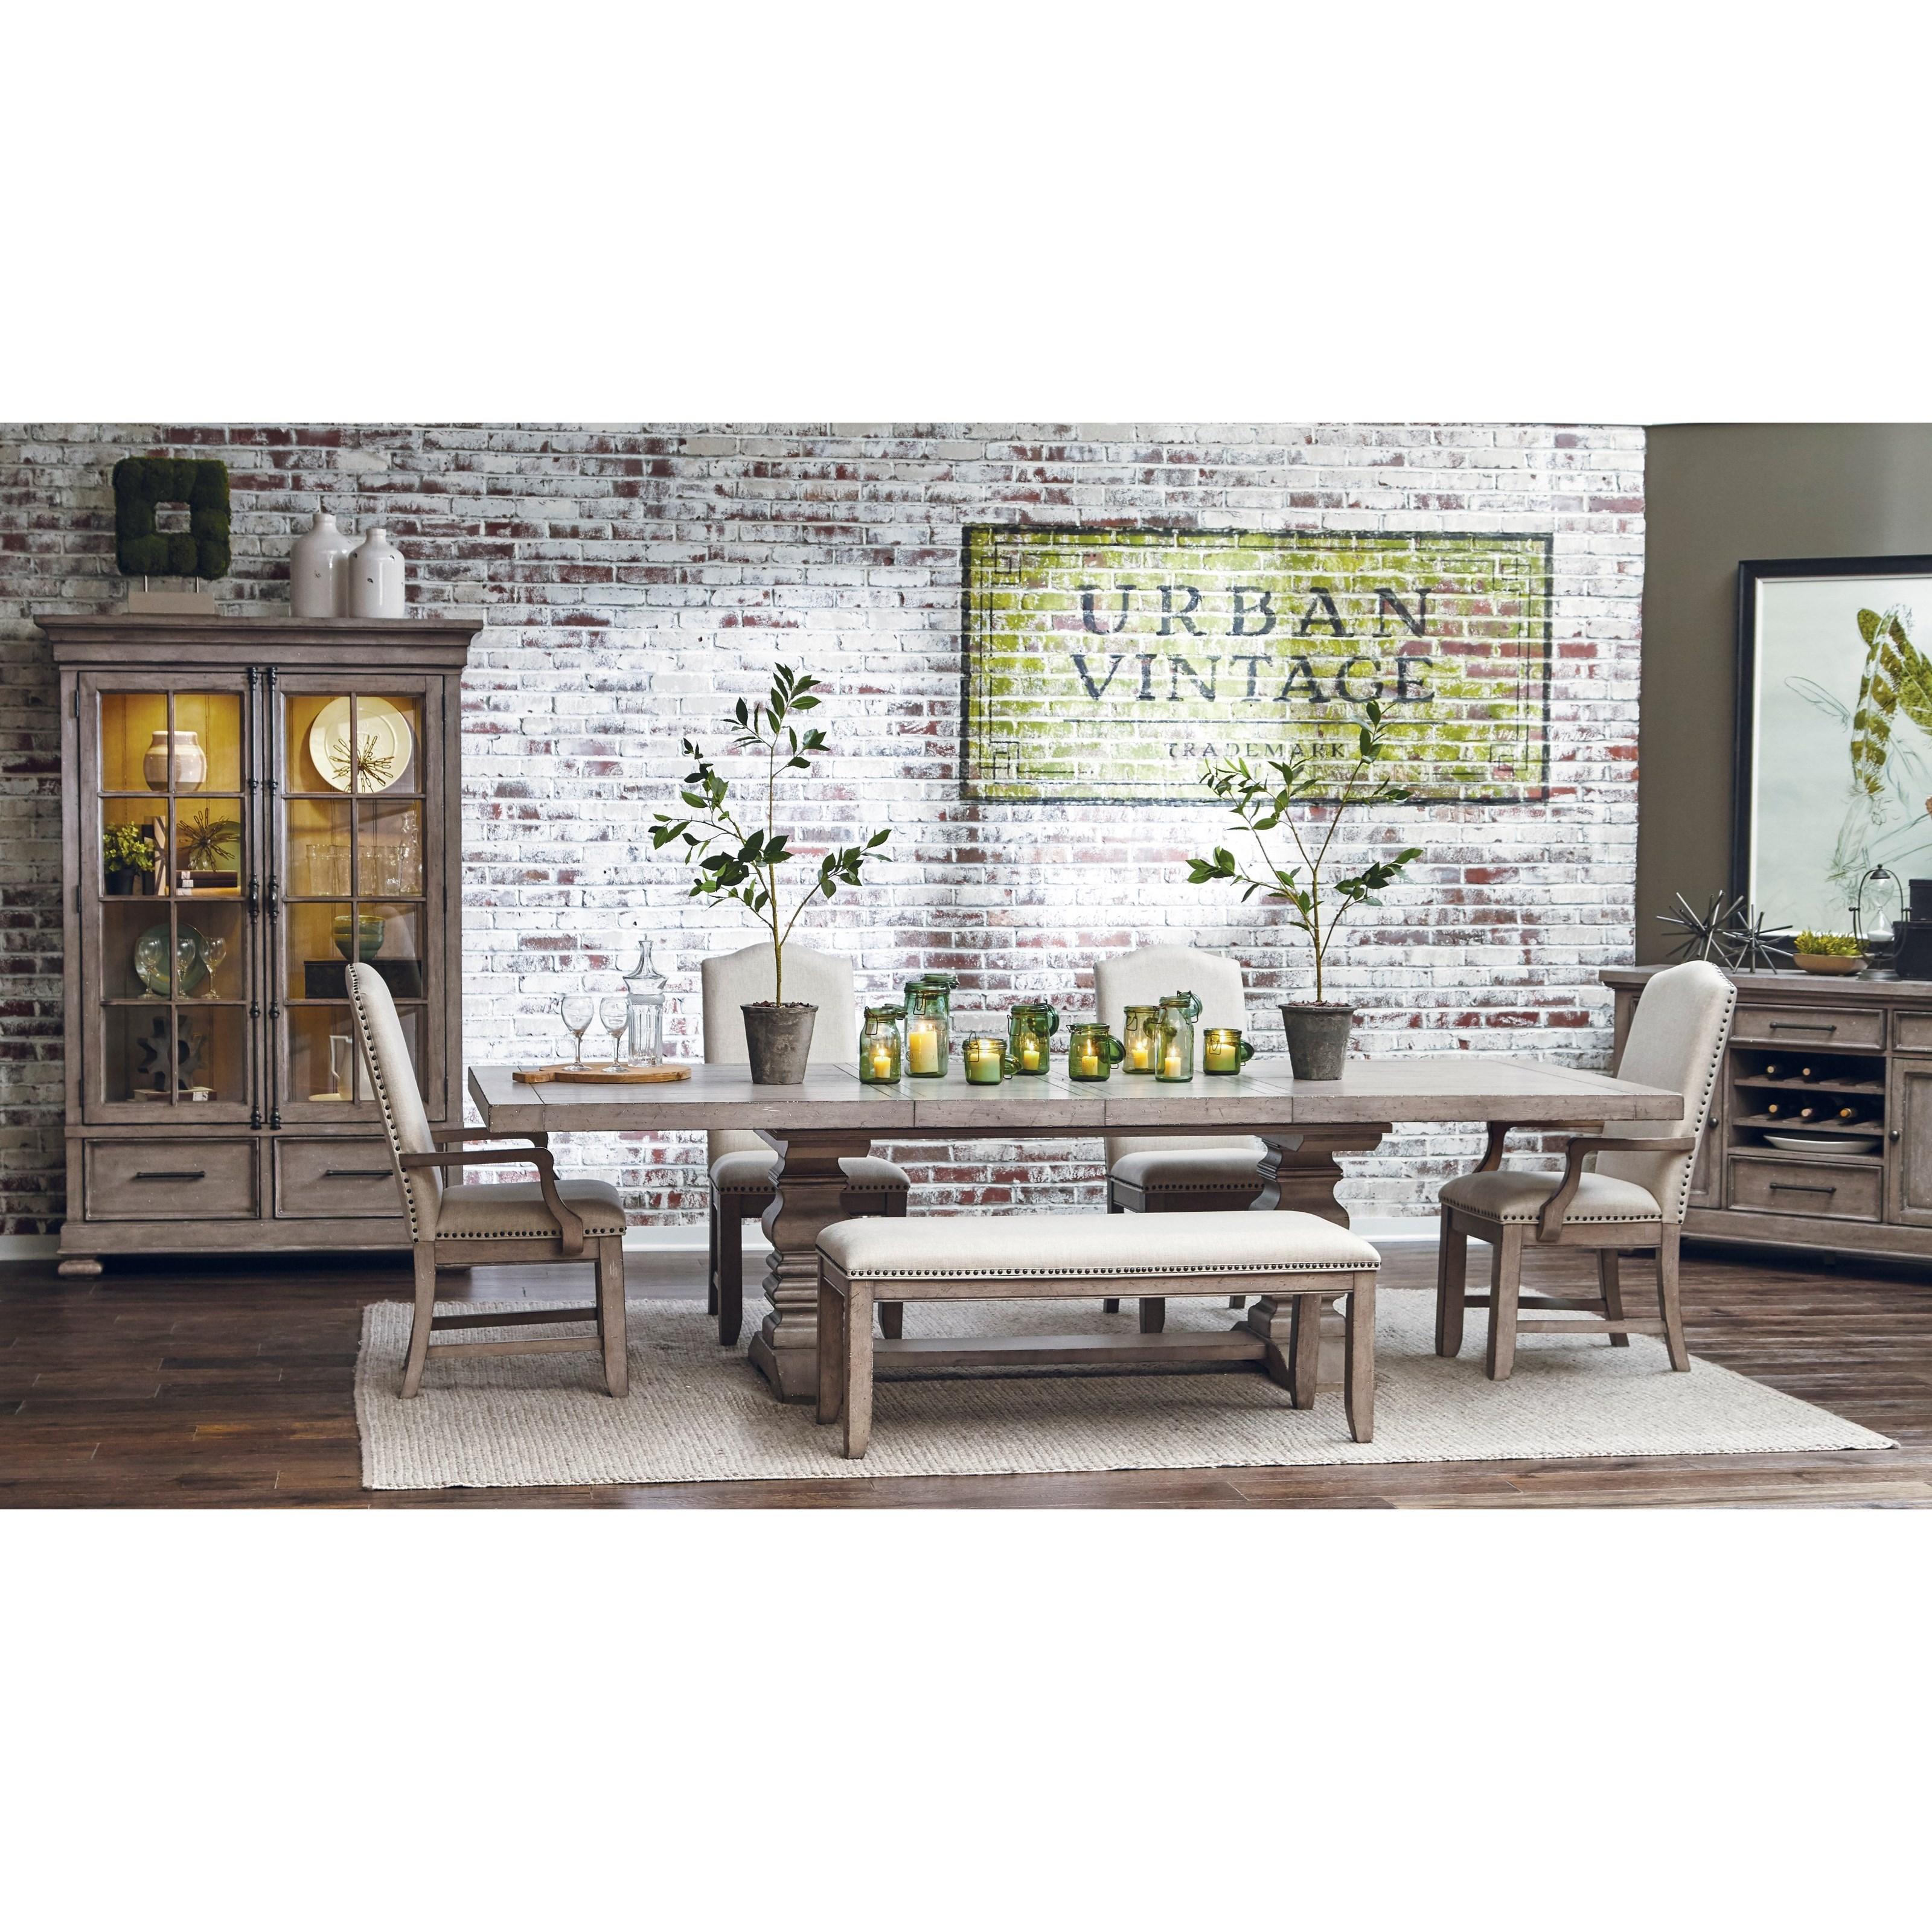 ... Morris Home Furnishings Webster StreetWebster Street Trestle Dining  Table